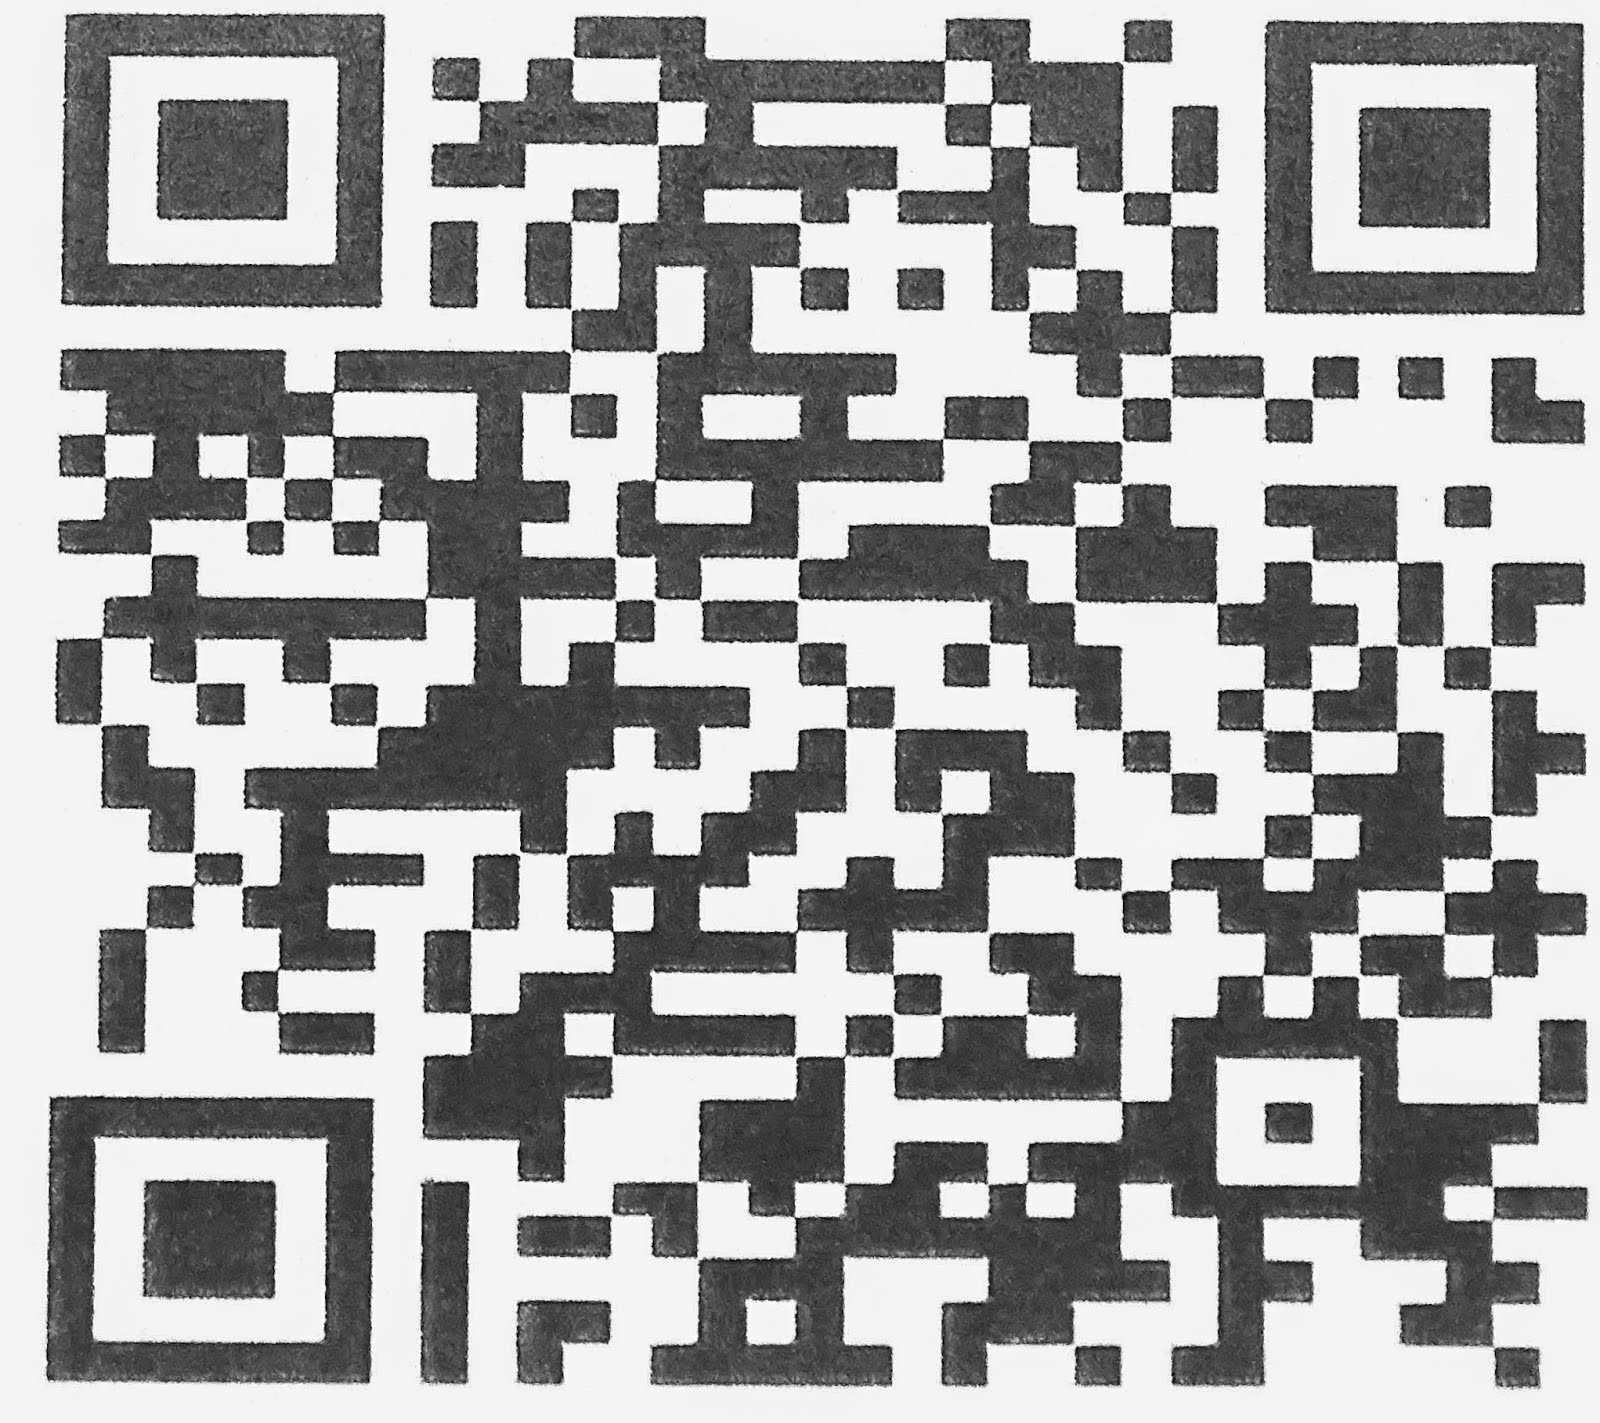 BYU Family History Library Webinars QR Code